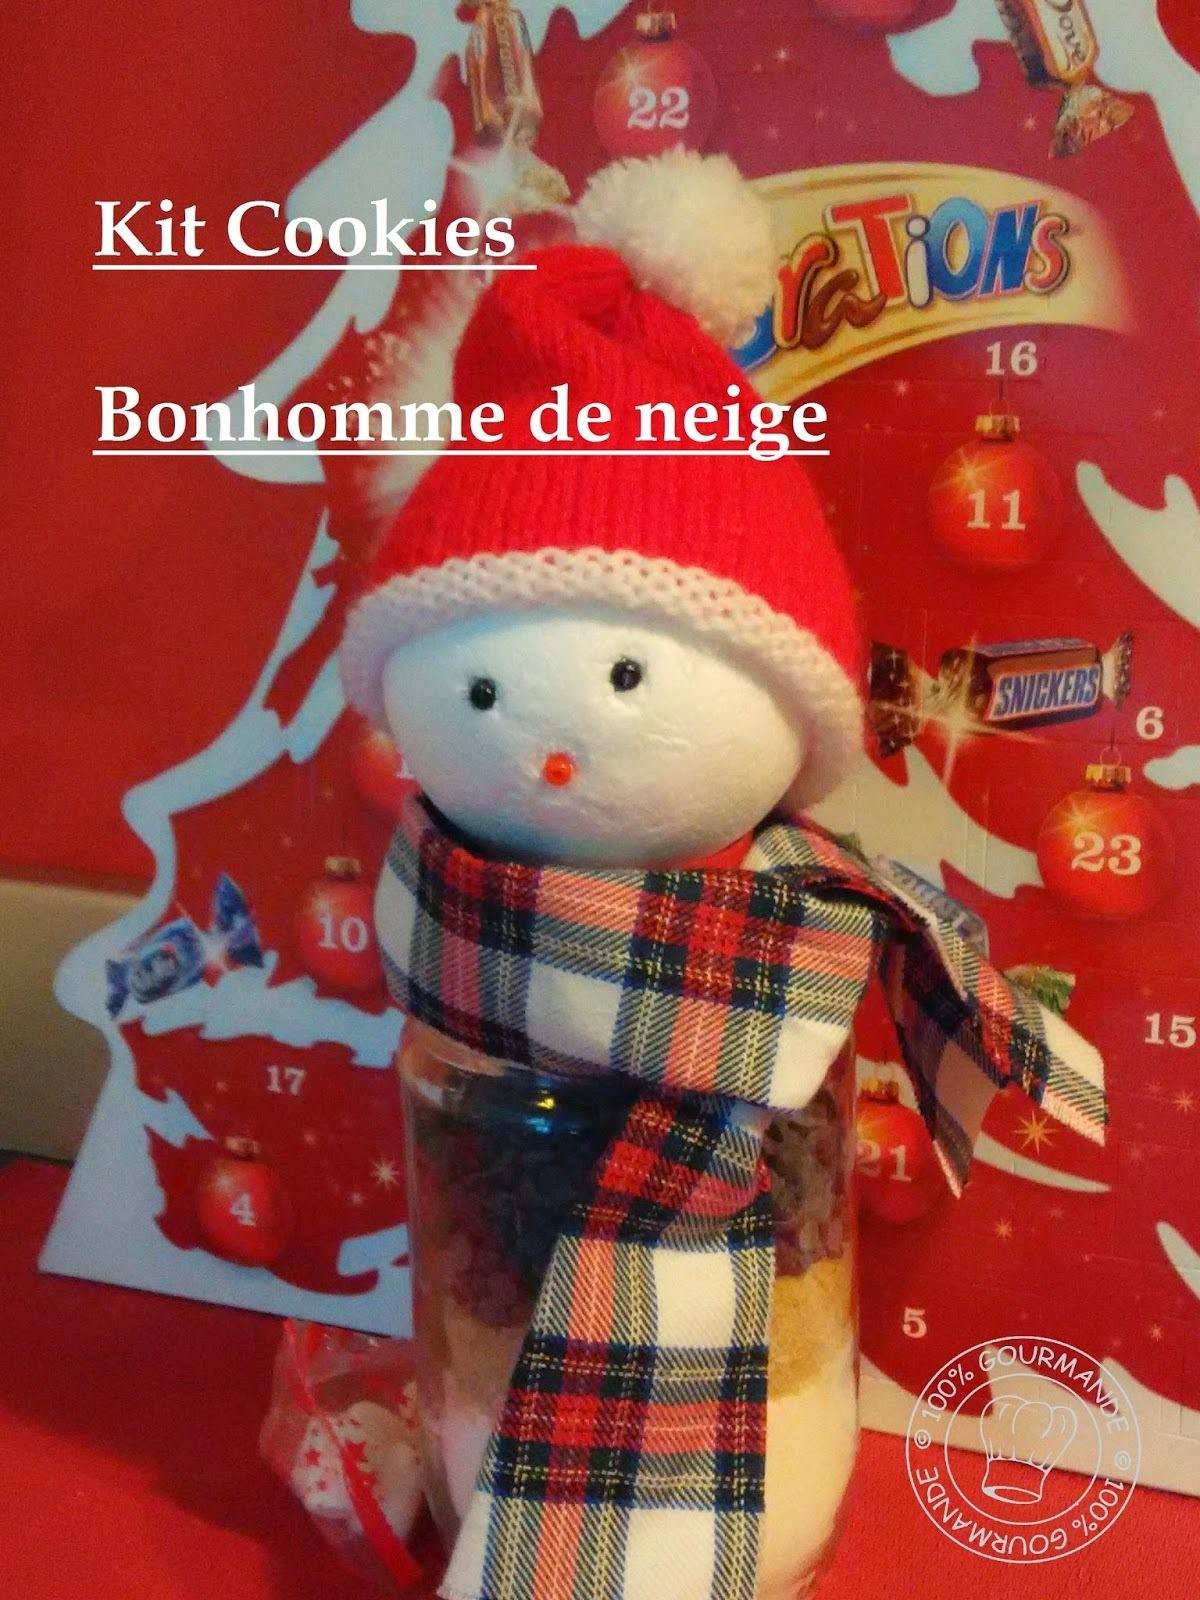 Kit Cookies bonhomme de neige